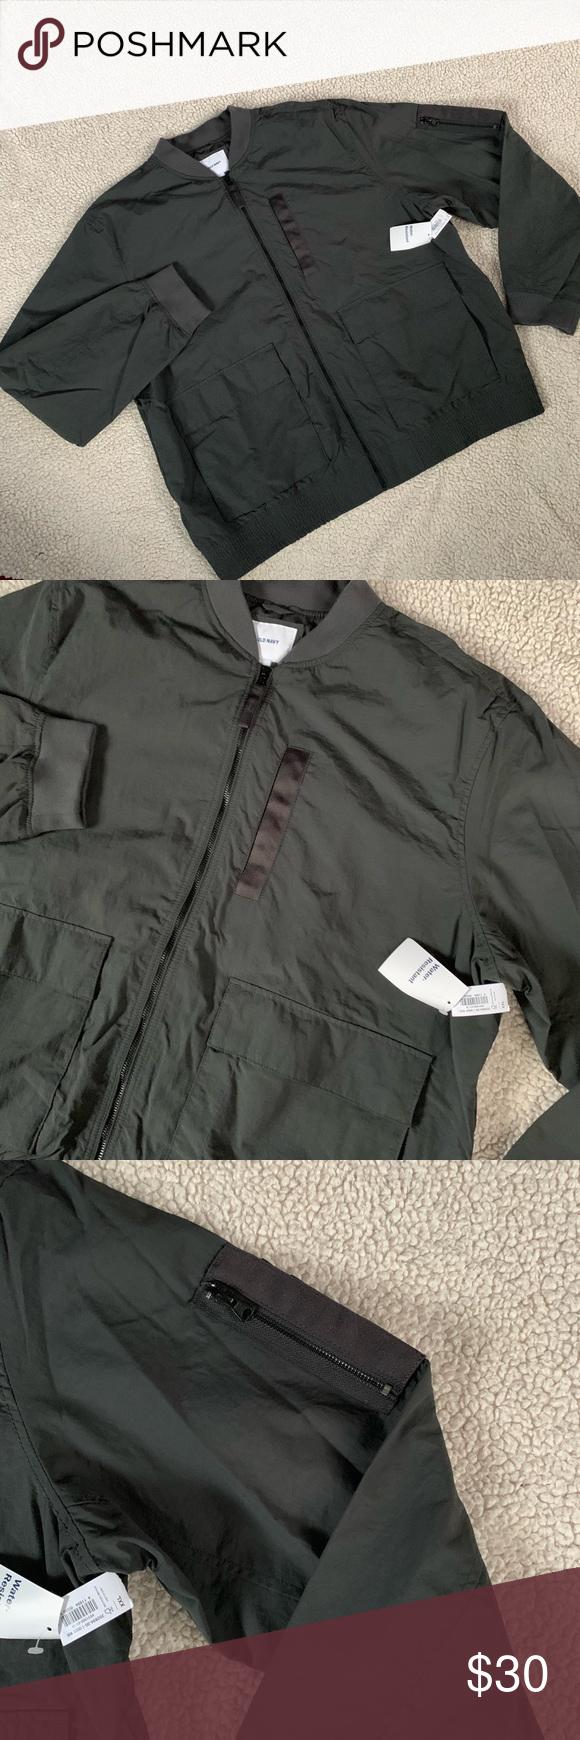 Old Navy Water Resistant Men S Bomber Jacket Xxl Clothes Design Fashion Design Fashion Tips [ 1740 x 580 Pixel ]